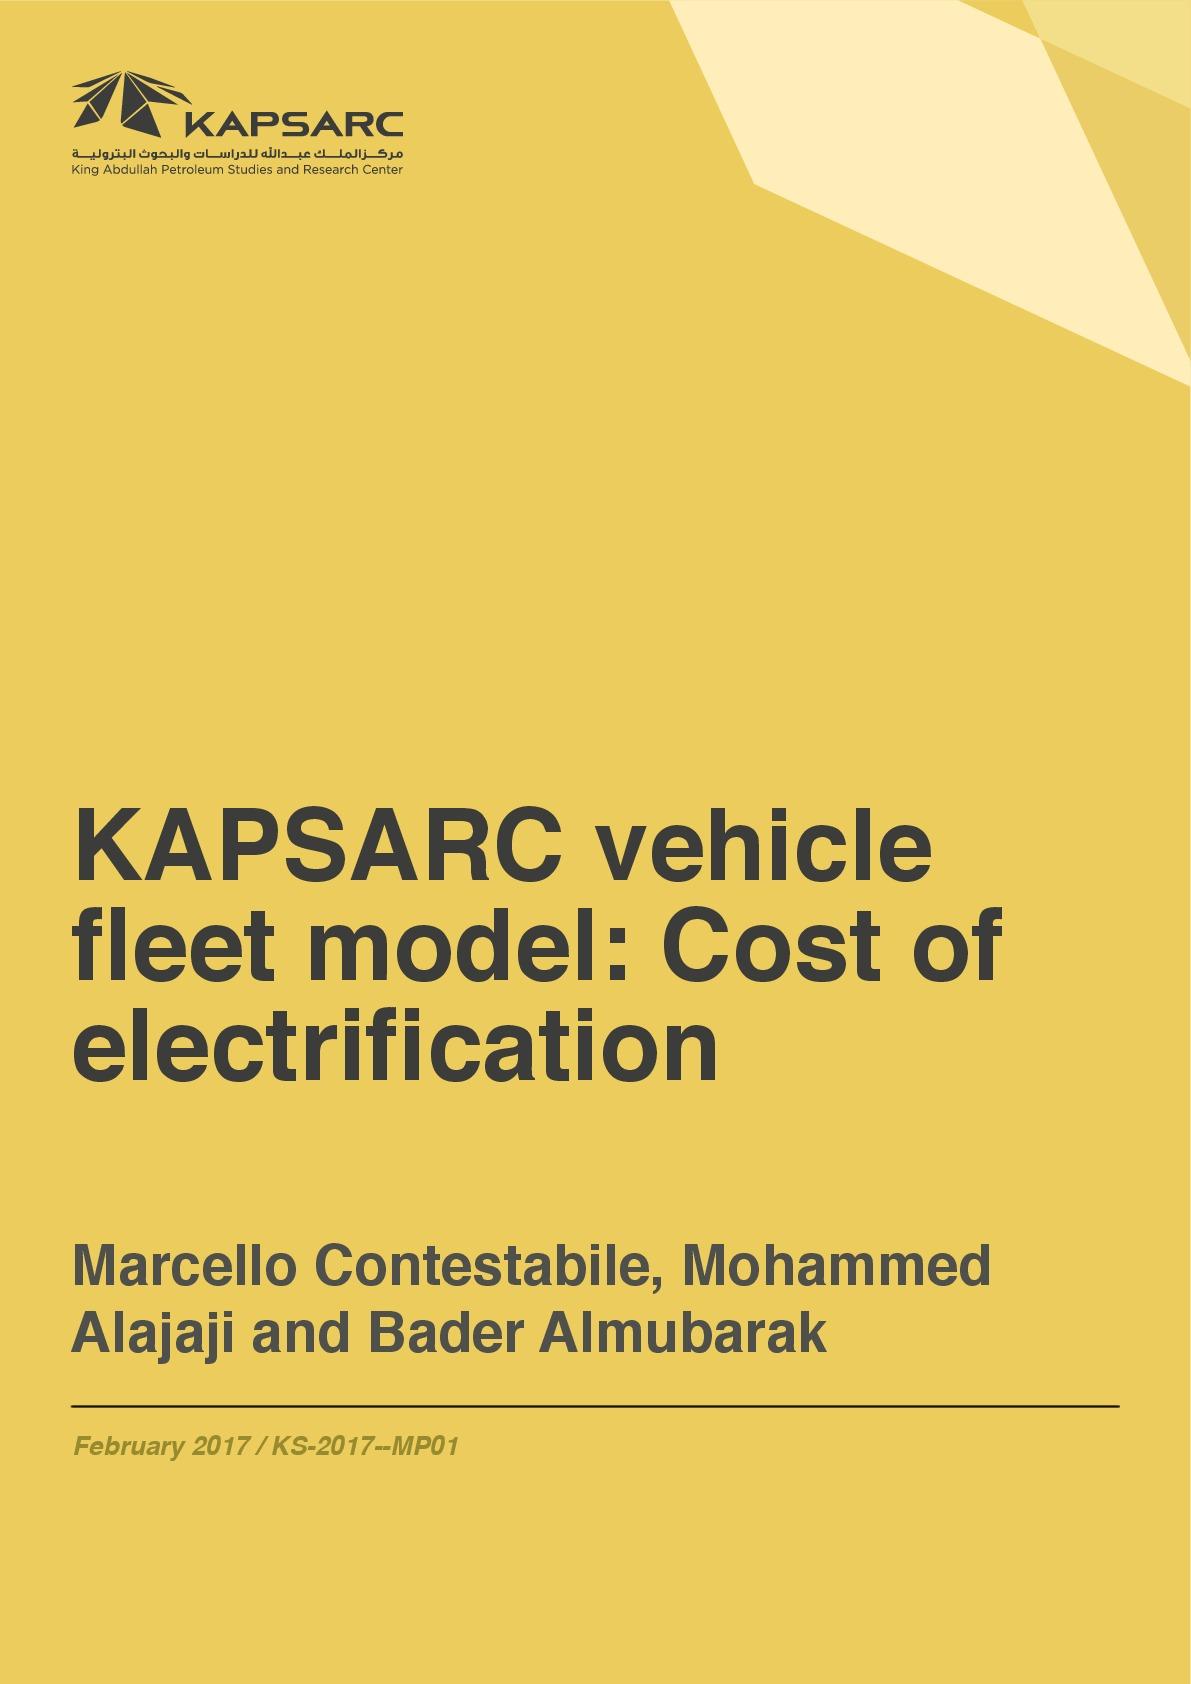 KAPSARC vehicle fleet model: Cost of electrification